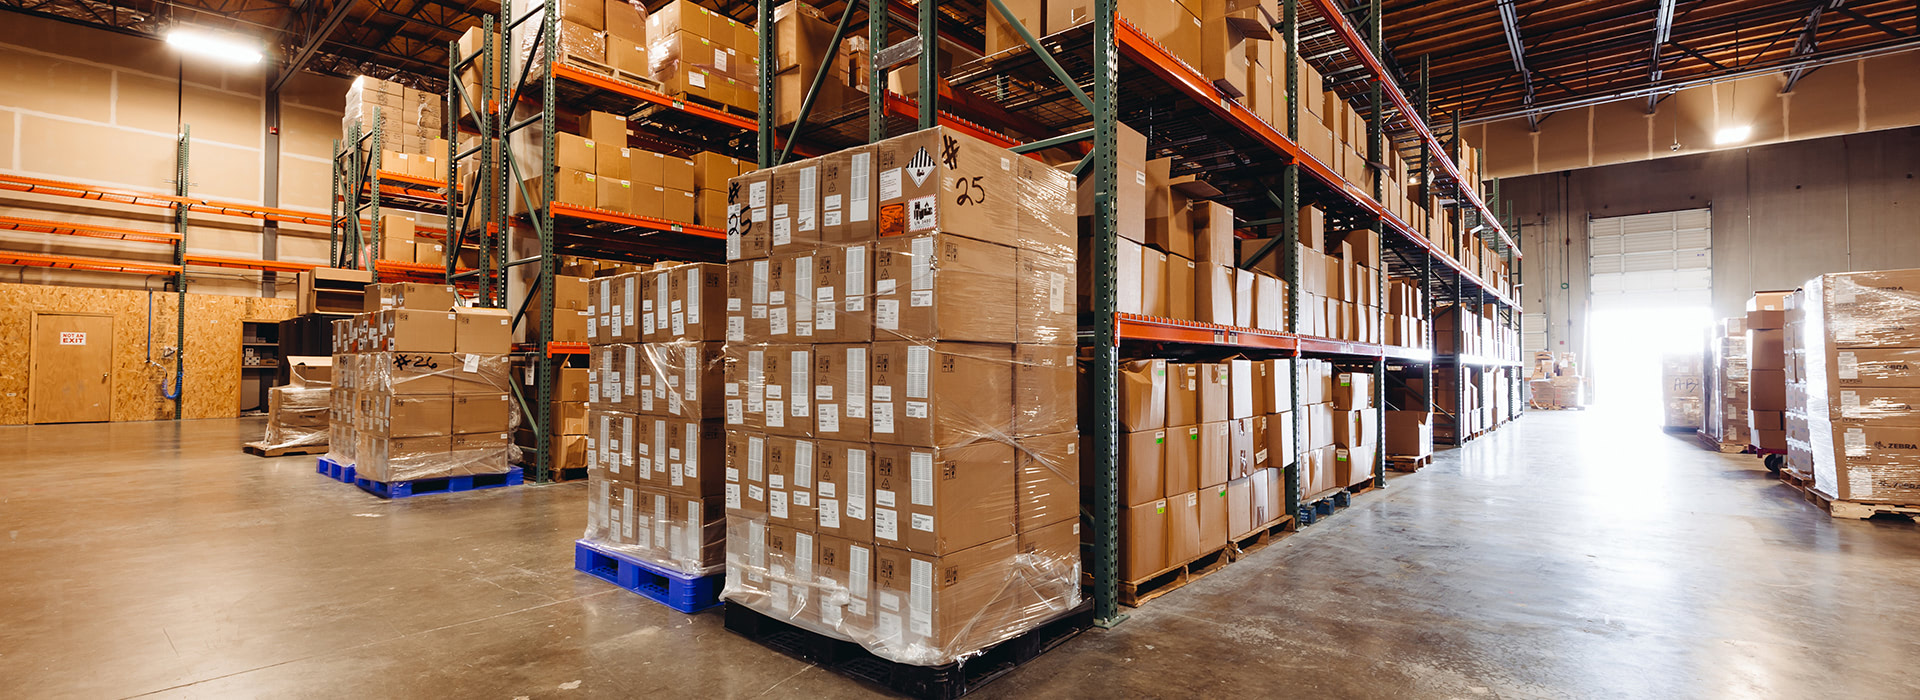 vmsbarcoding-warehouse-2021d